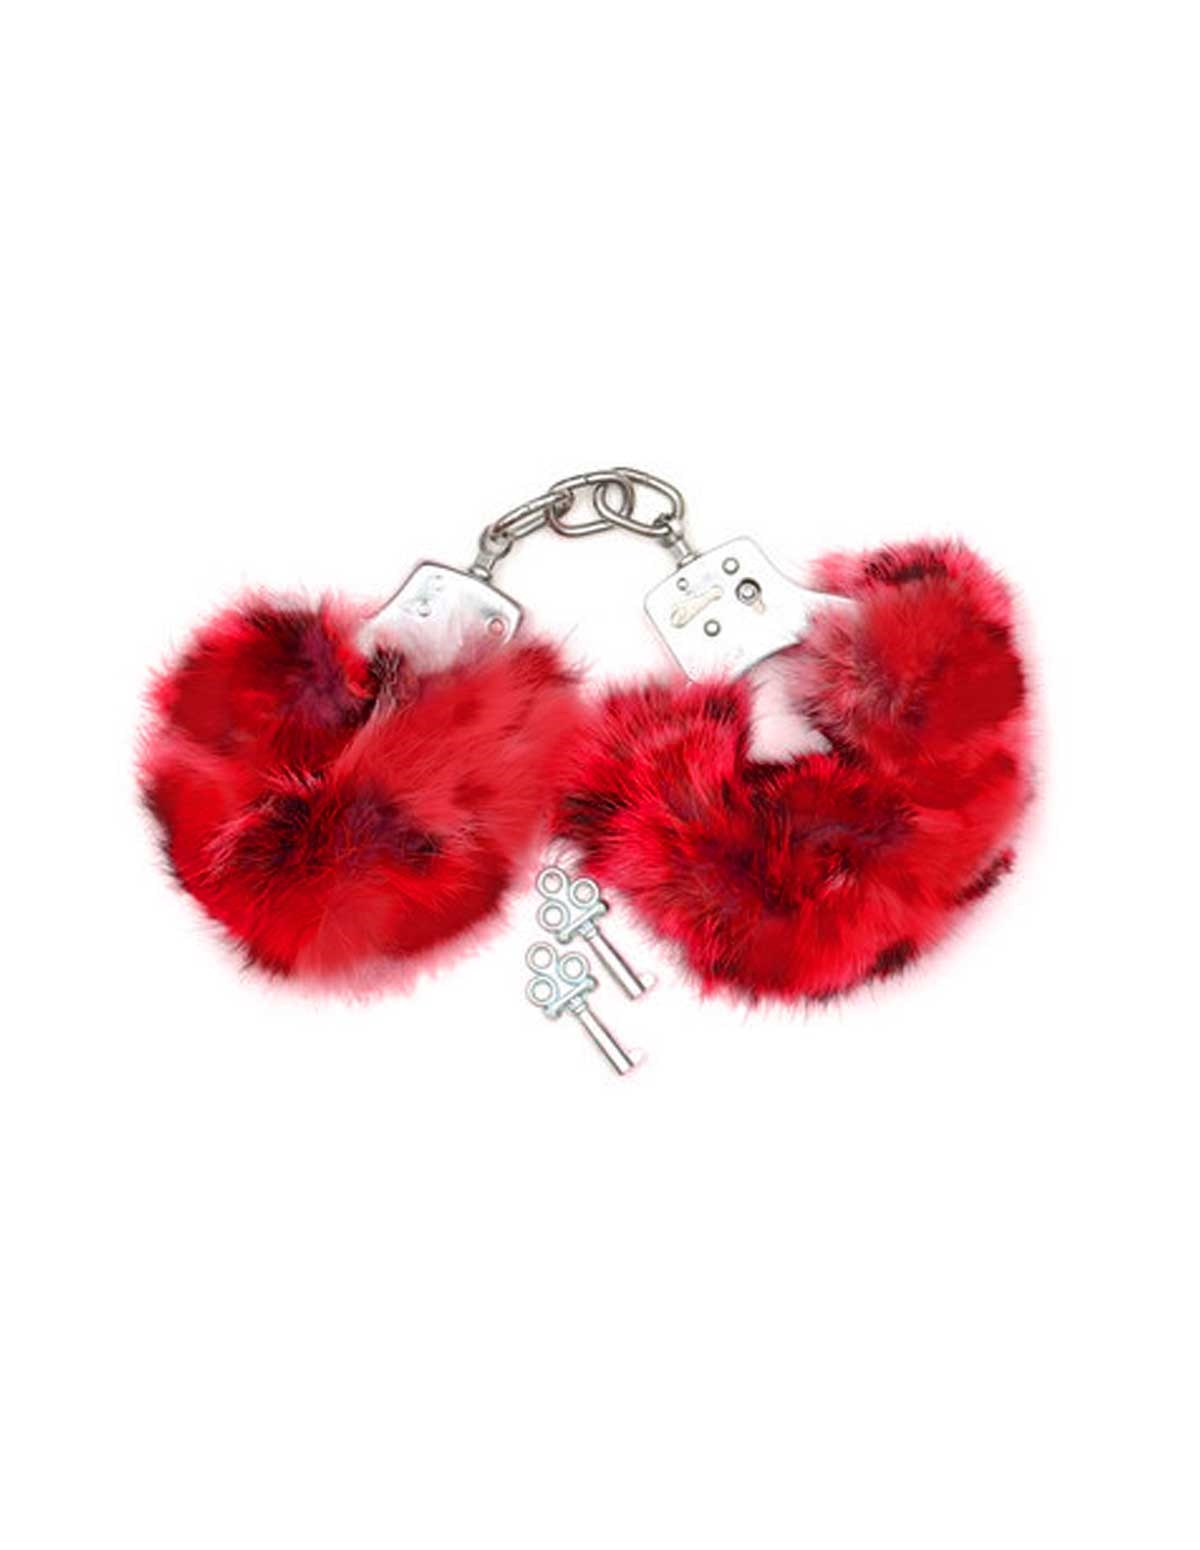 Rabbit Fur Handcuffs Red